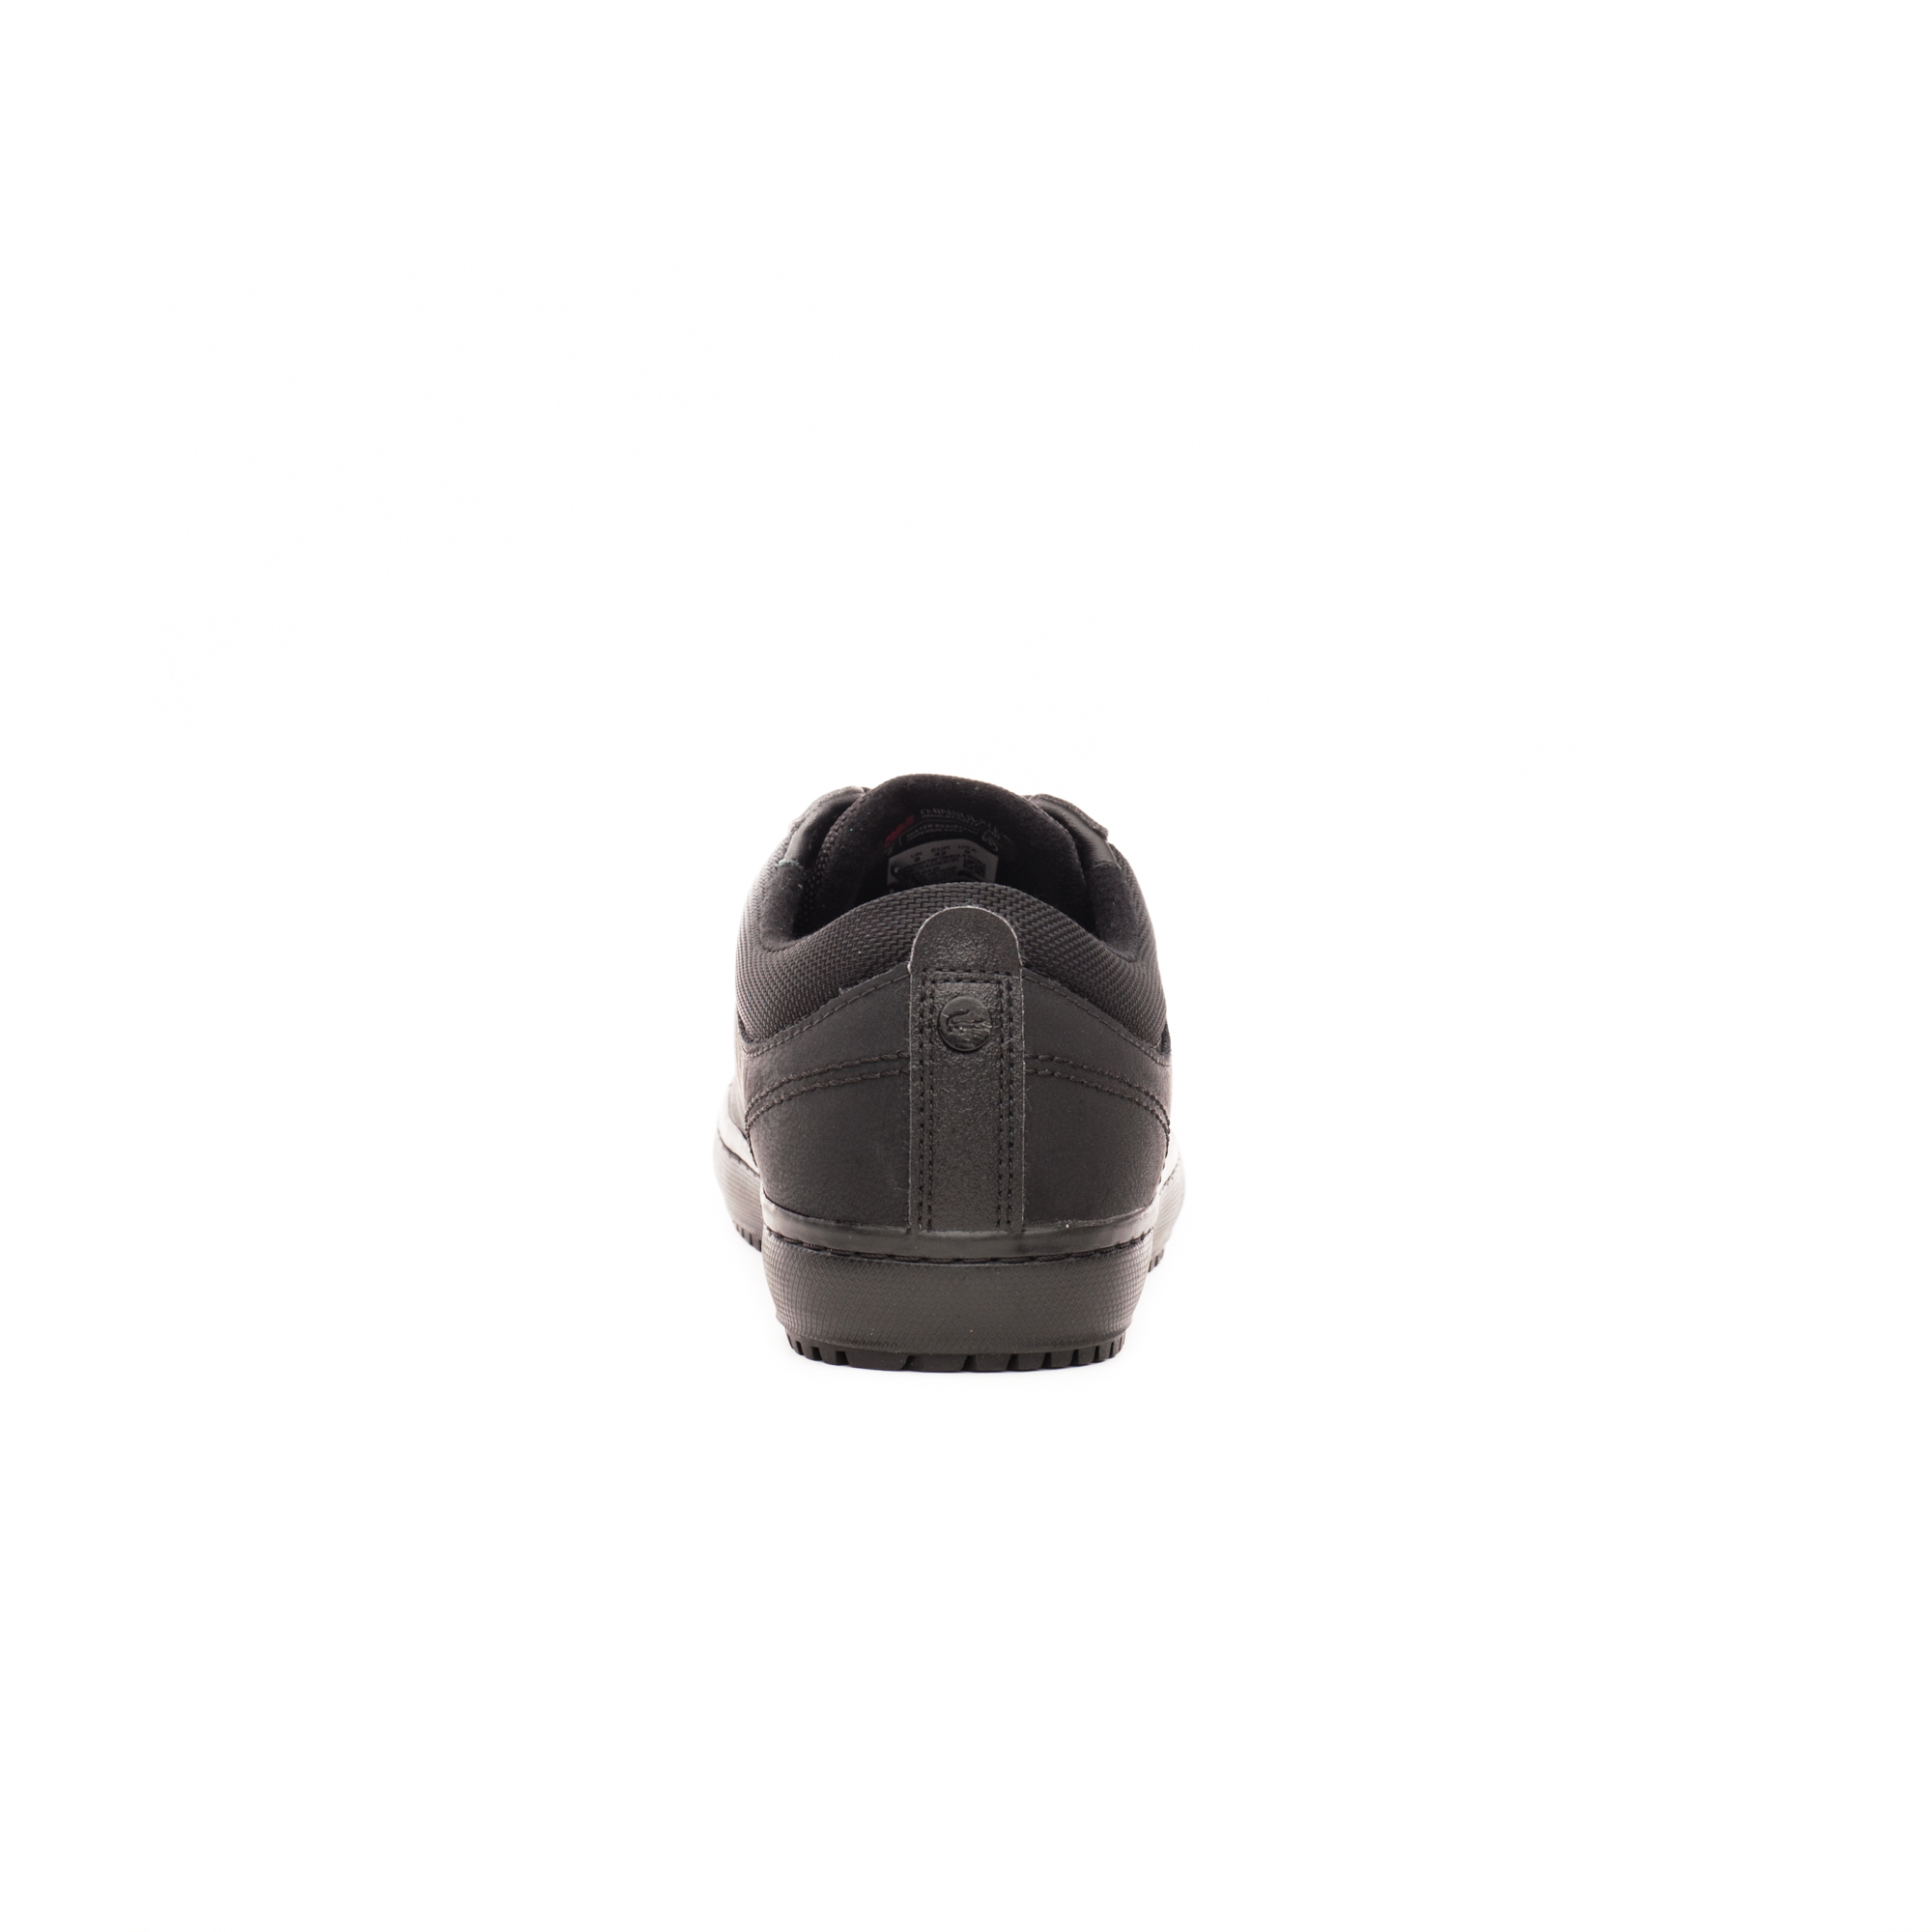 Кросівки чоловічі Lacoste STRAIGHTSET INSULATE